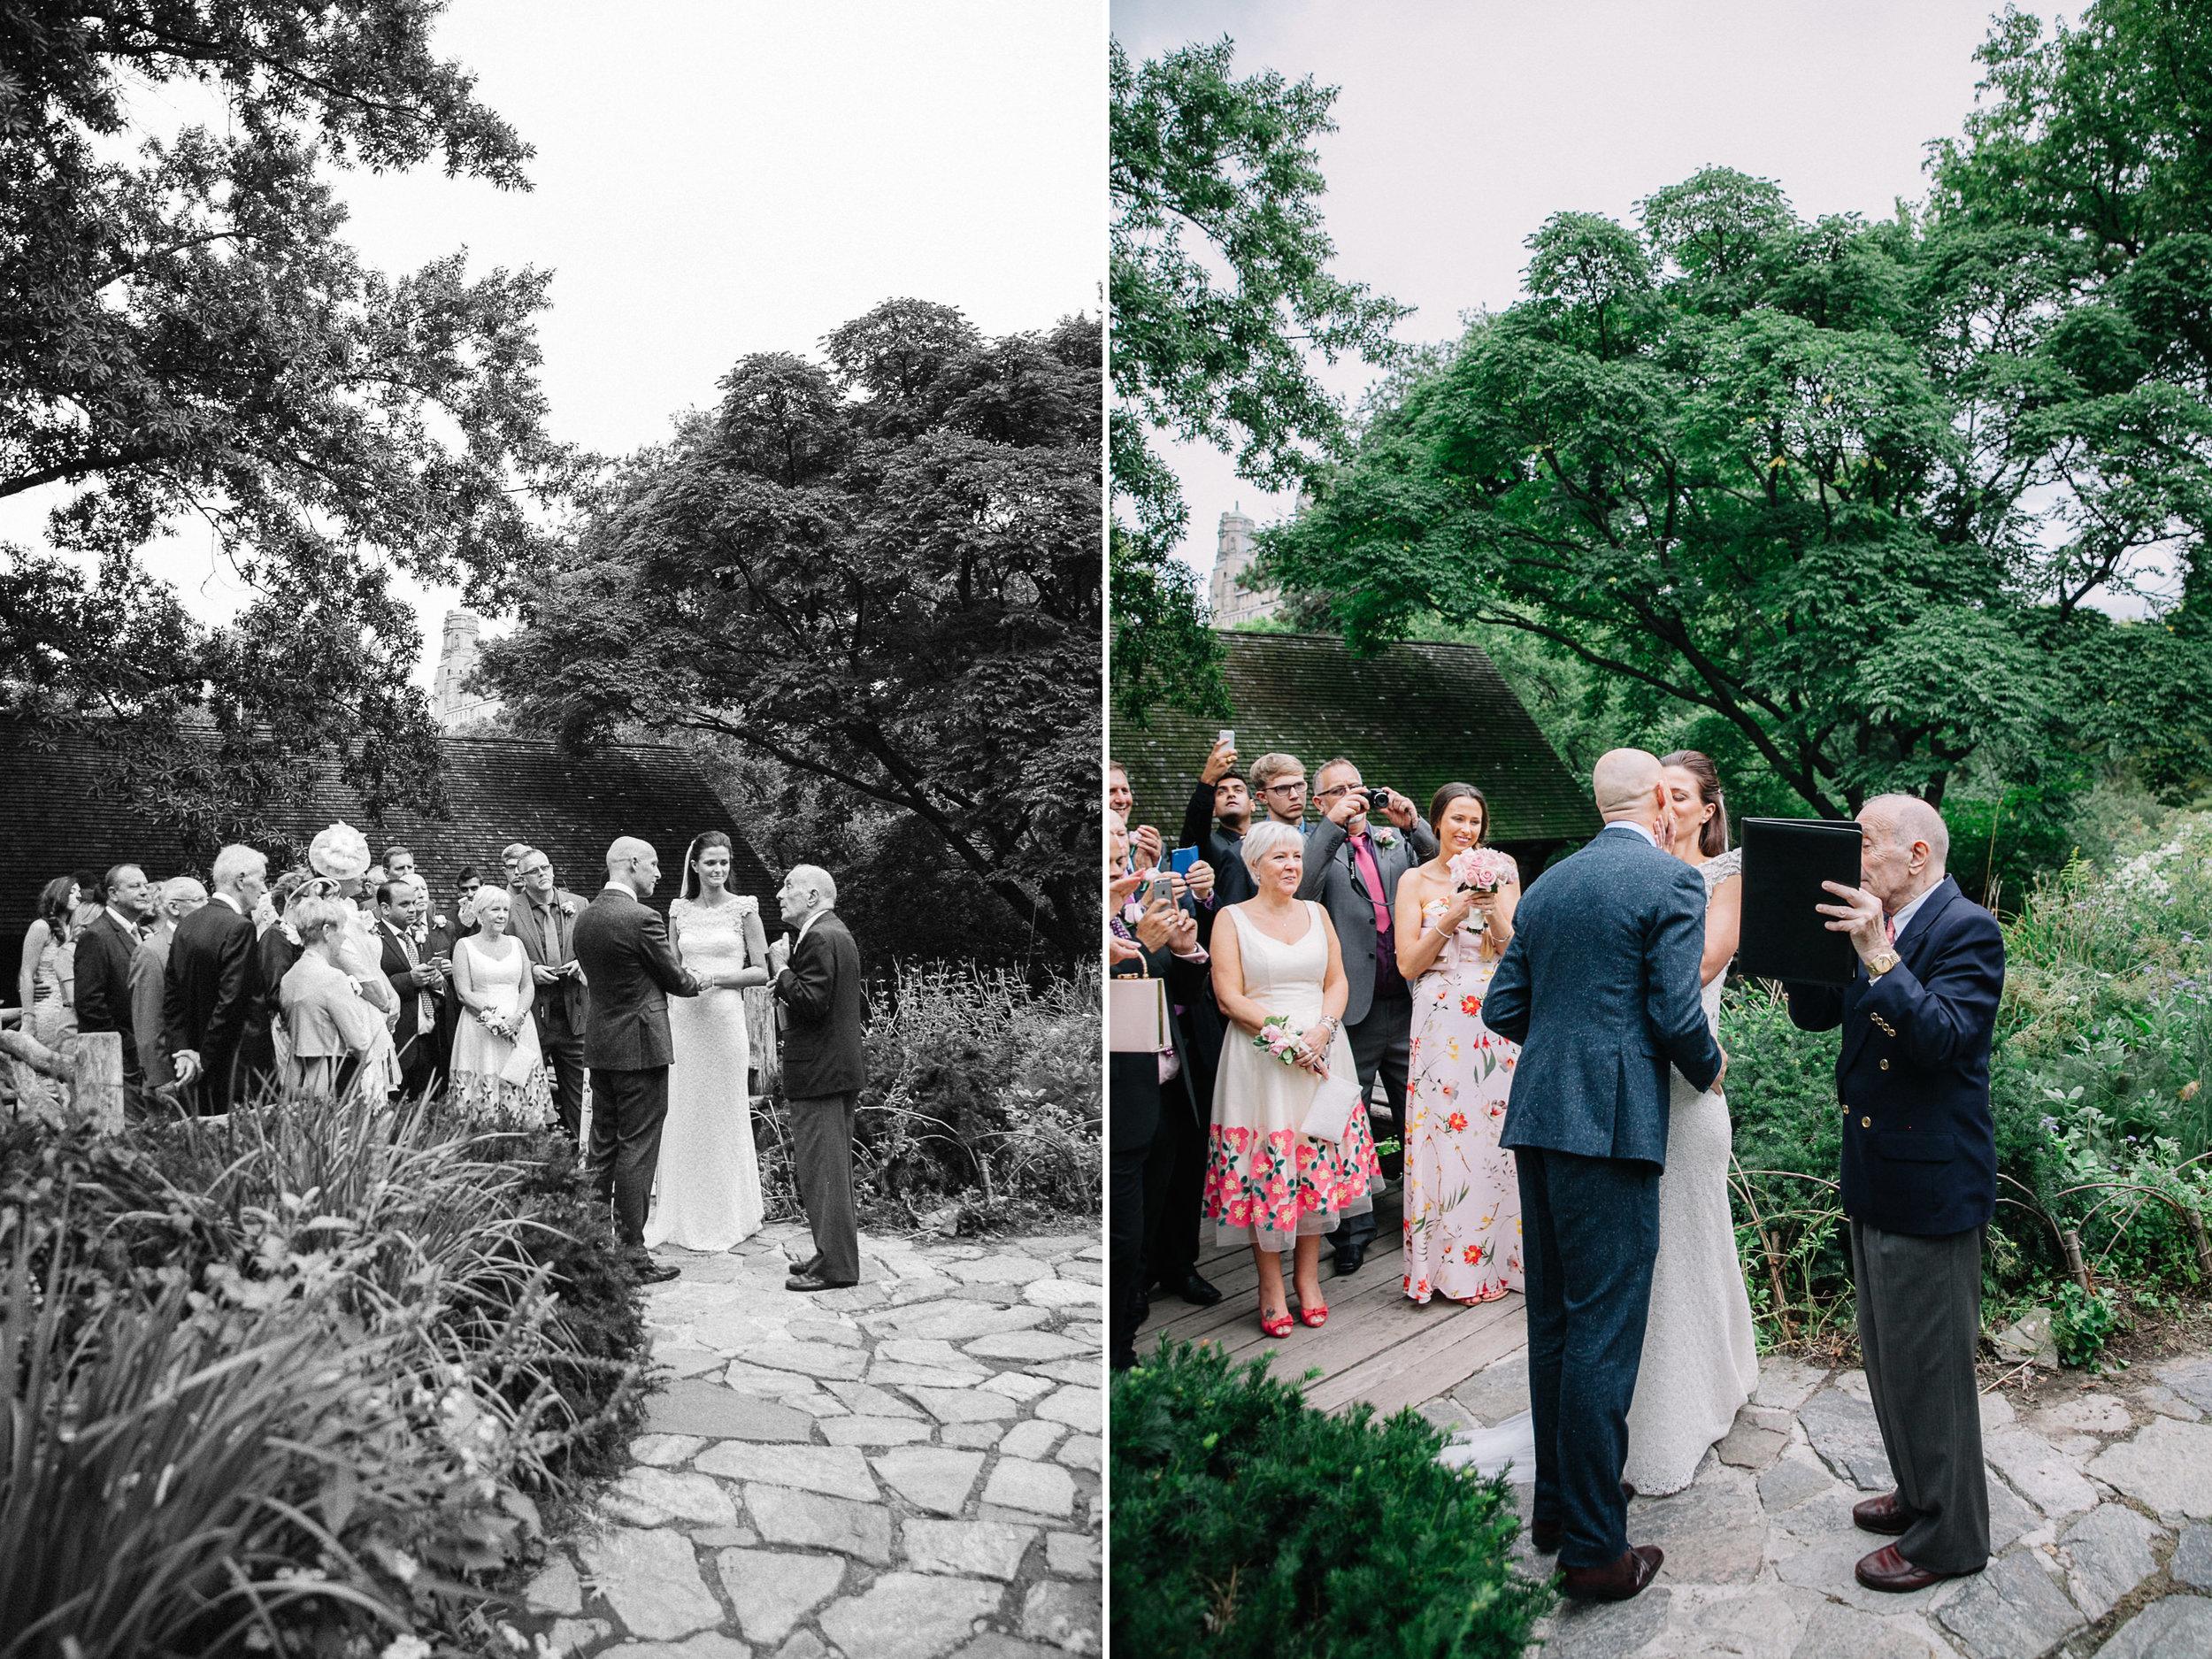 Shakespeare-garden-central-park-intimate-wedding-14-.jpg